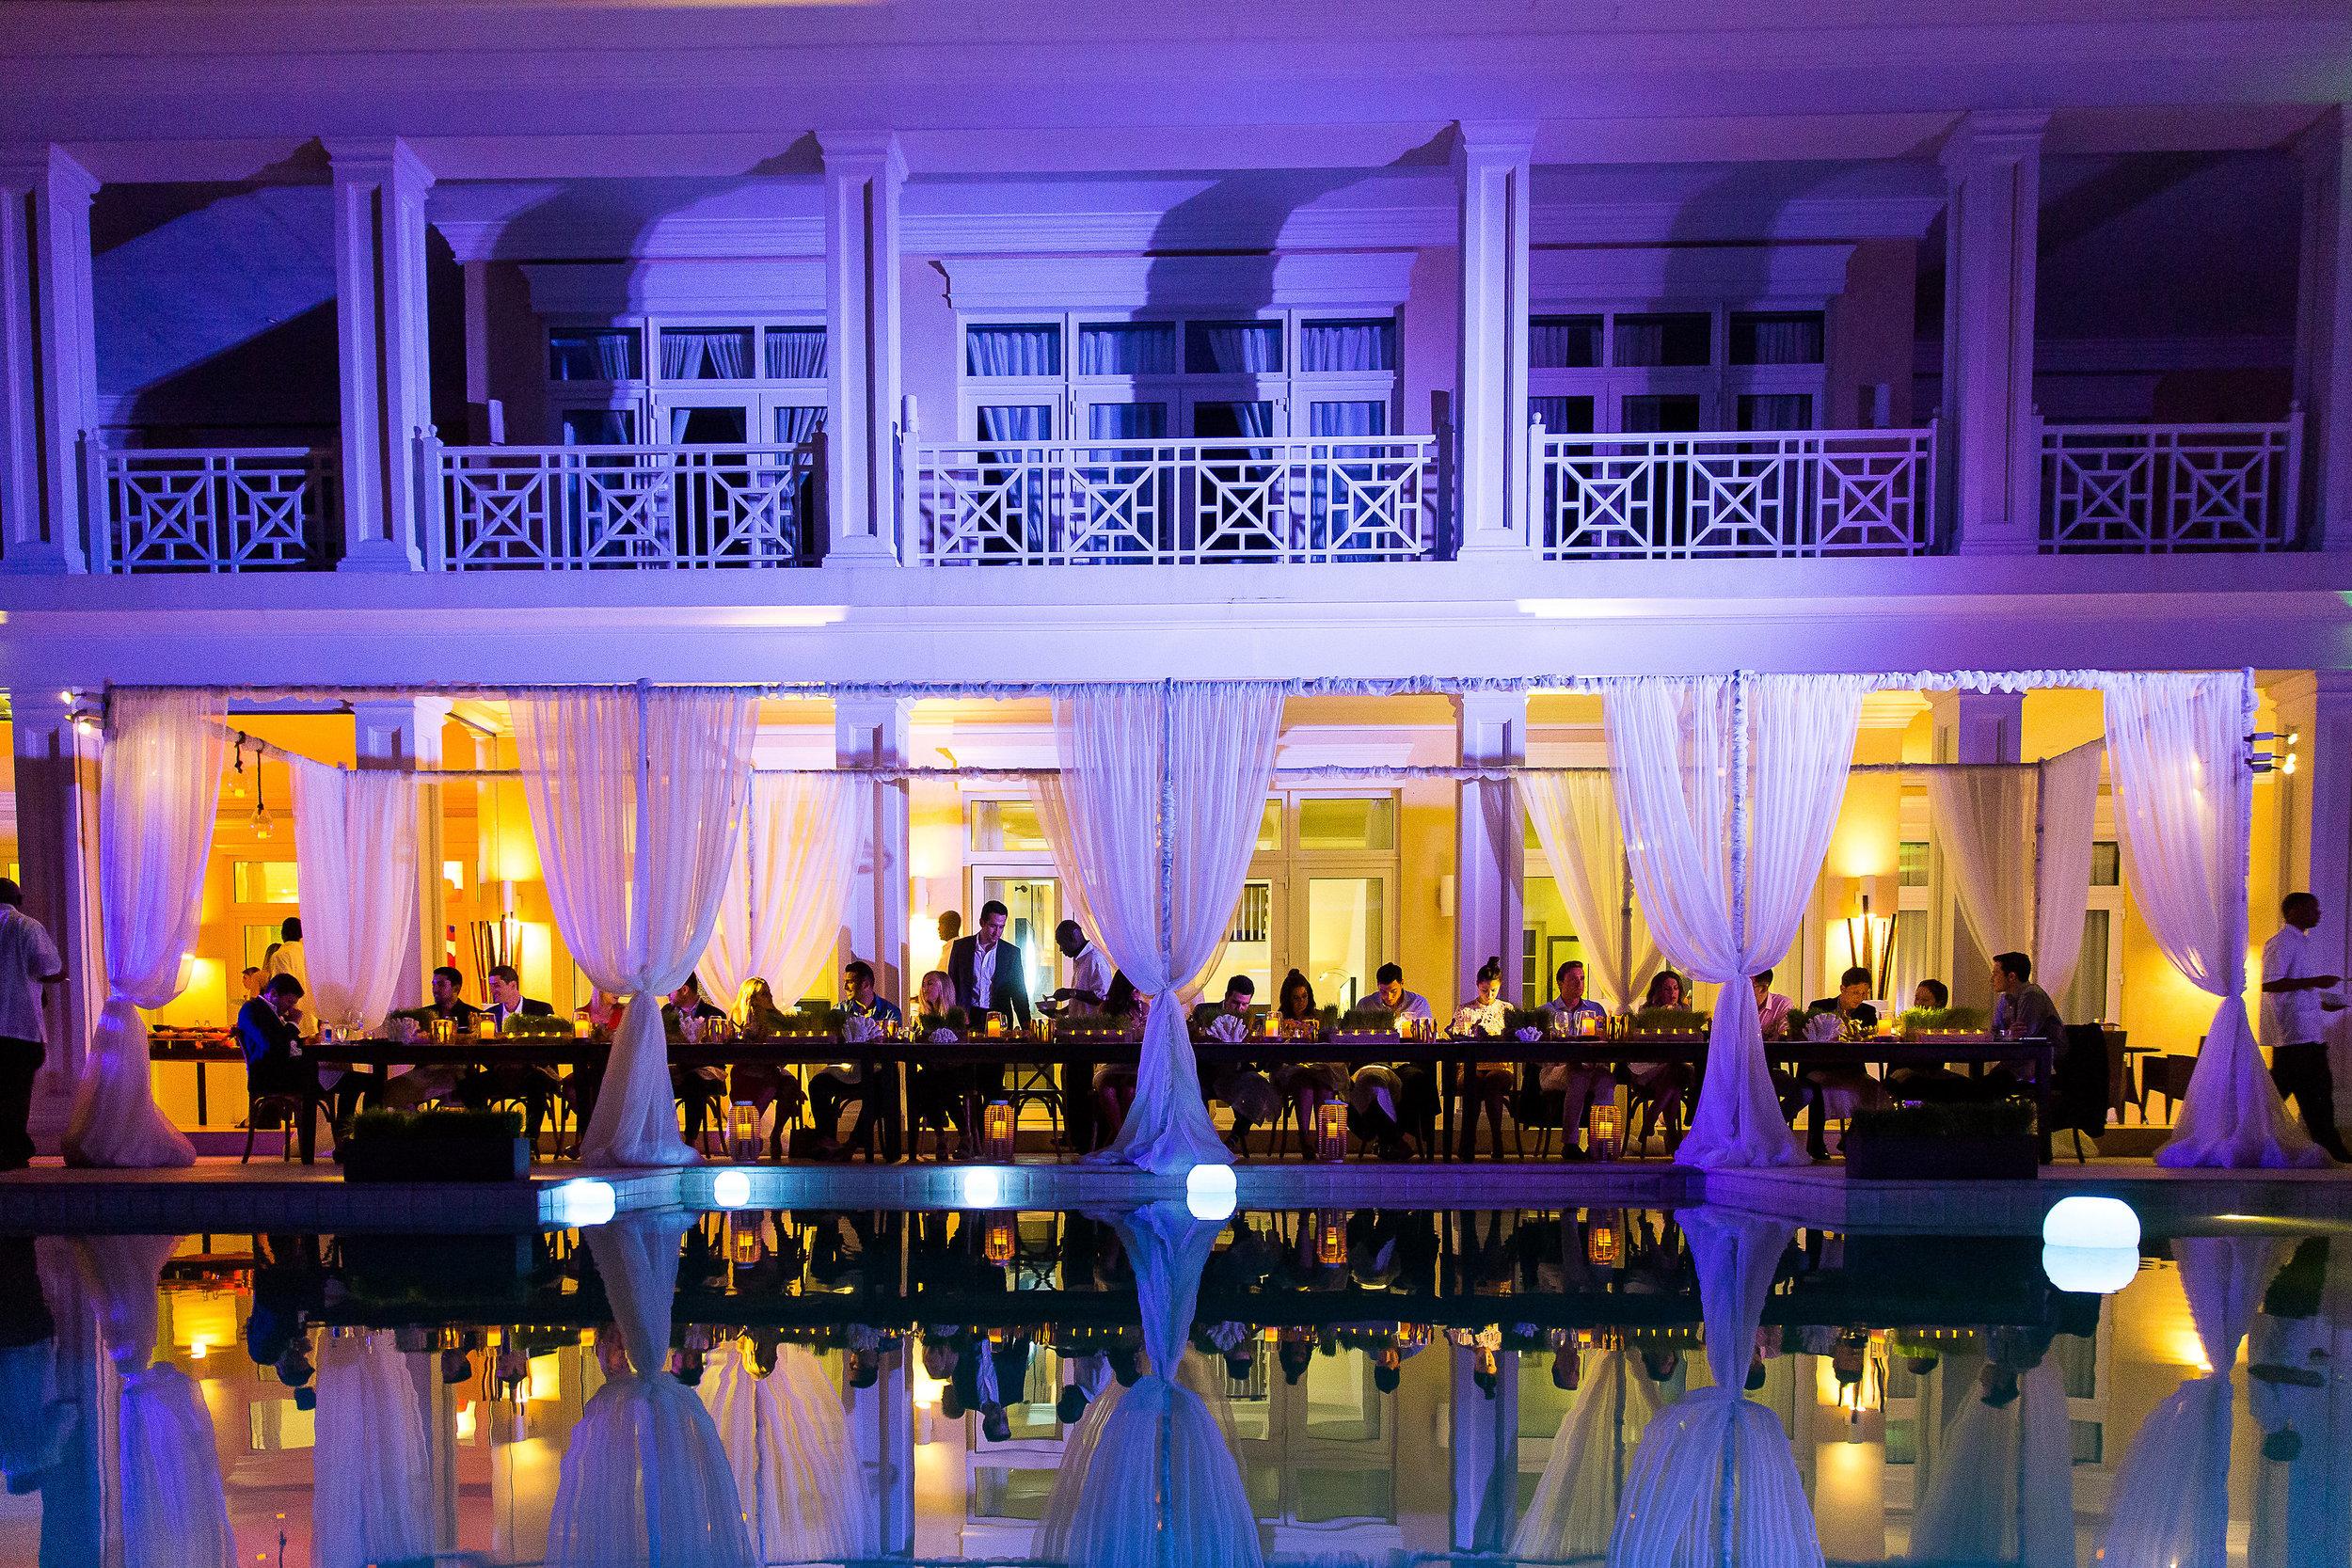 Ceci_New_York_Ceci_Style_Ceci_Johnson_Luxury_Lifestyle_Destination_Bahamas_Wedding_Letterpress_Inspiration_Design_Custom_Couture_Personalized_Invitations_20.jpg